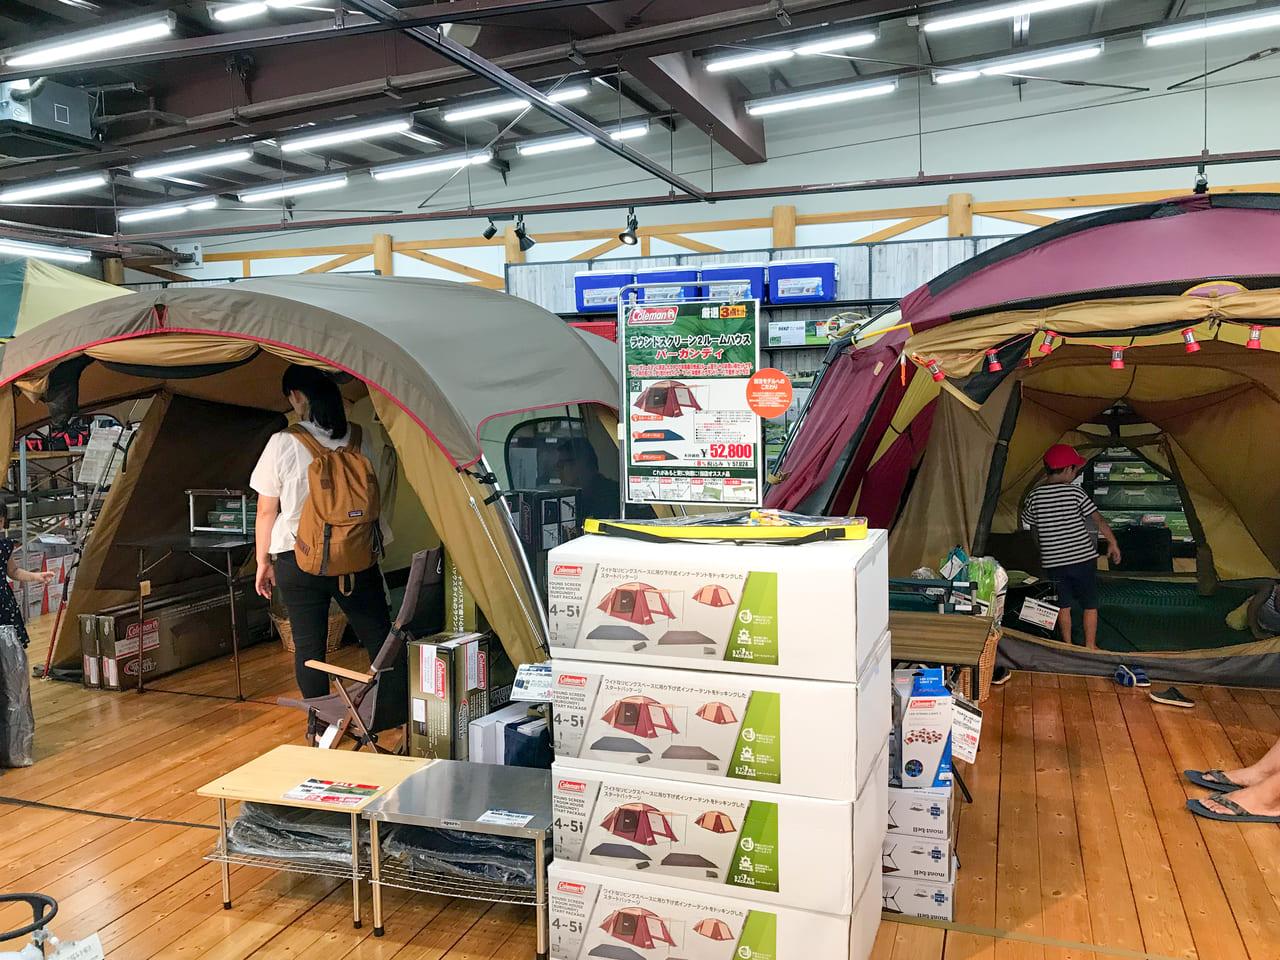 /WILD-1多摩ニュータウン店に展示されているコールマンのテント